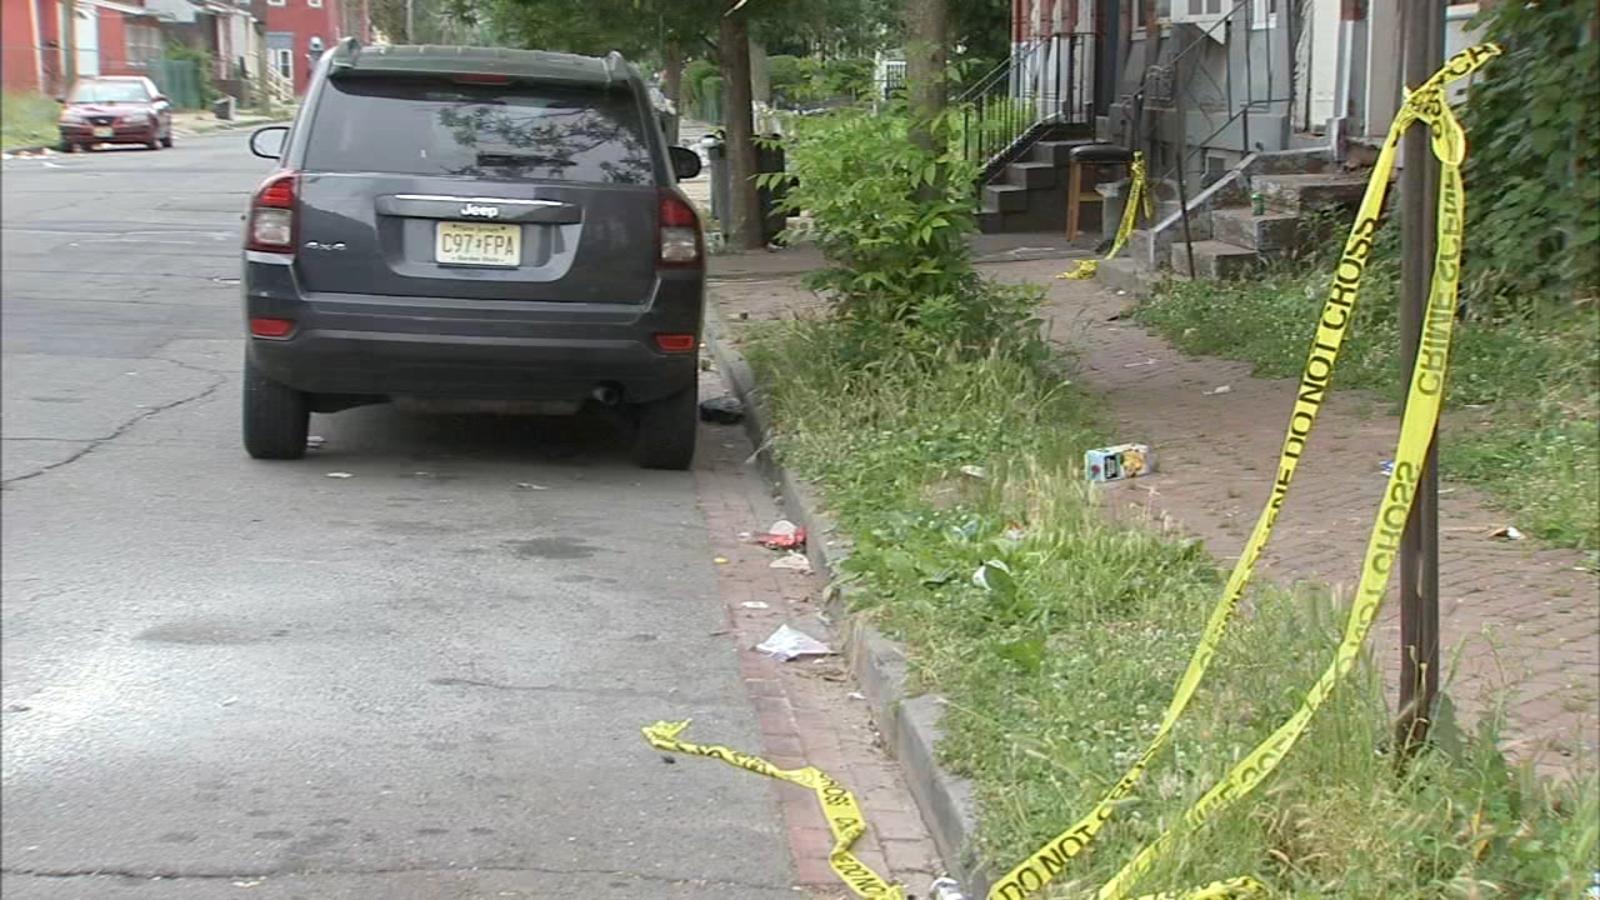 1 dead, 5 injured in Trenton shooting